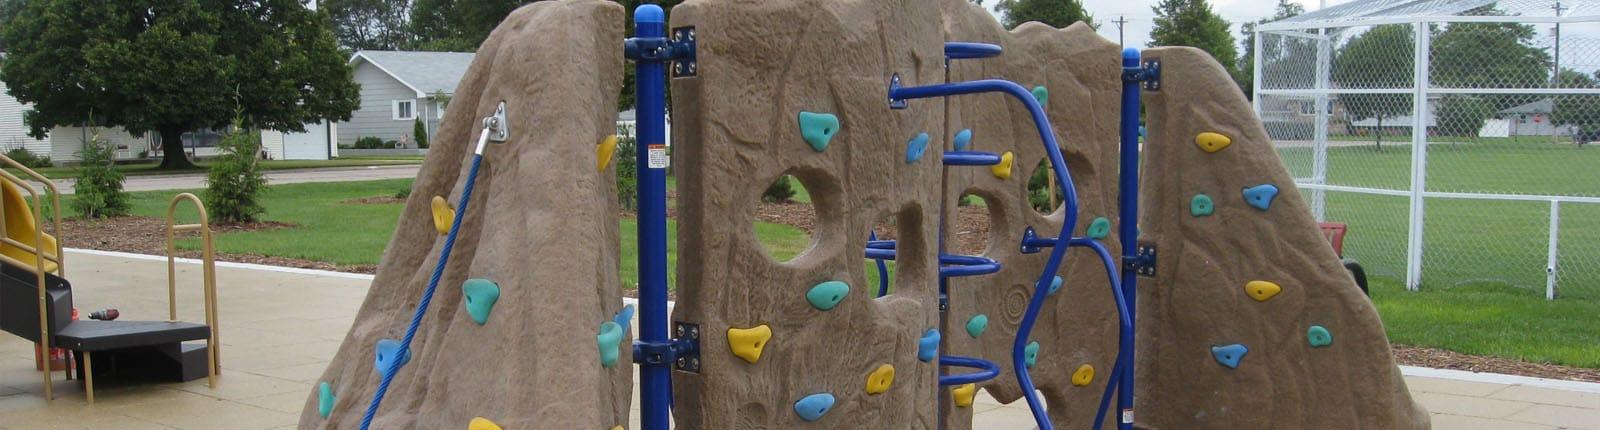 Modular Play Rock Climbing Wall | Sterling West